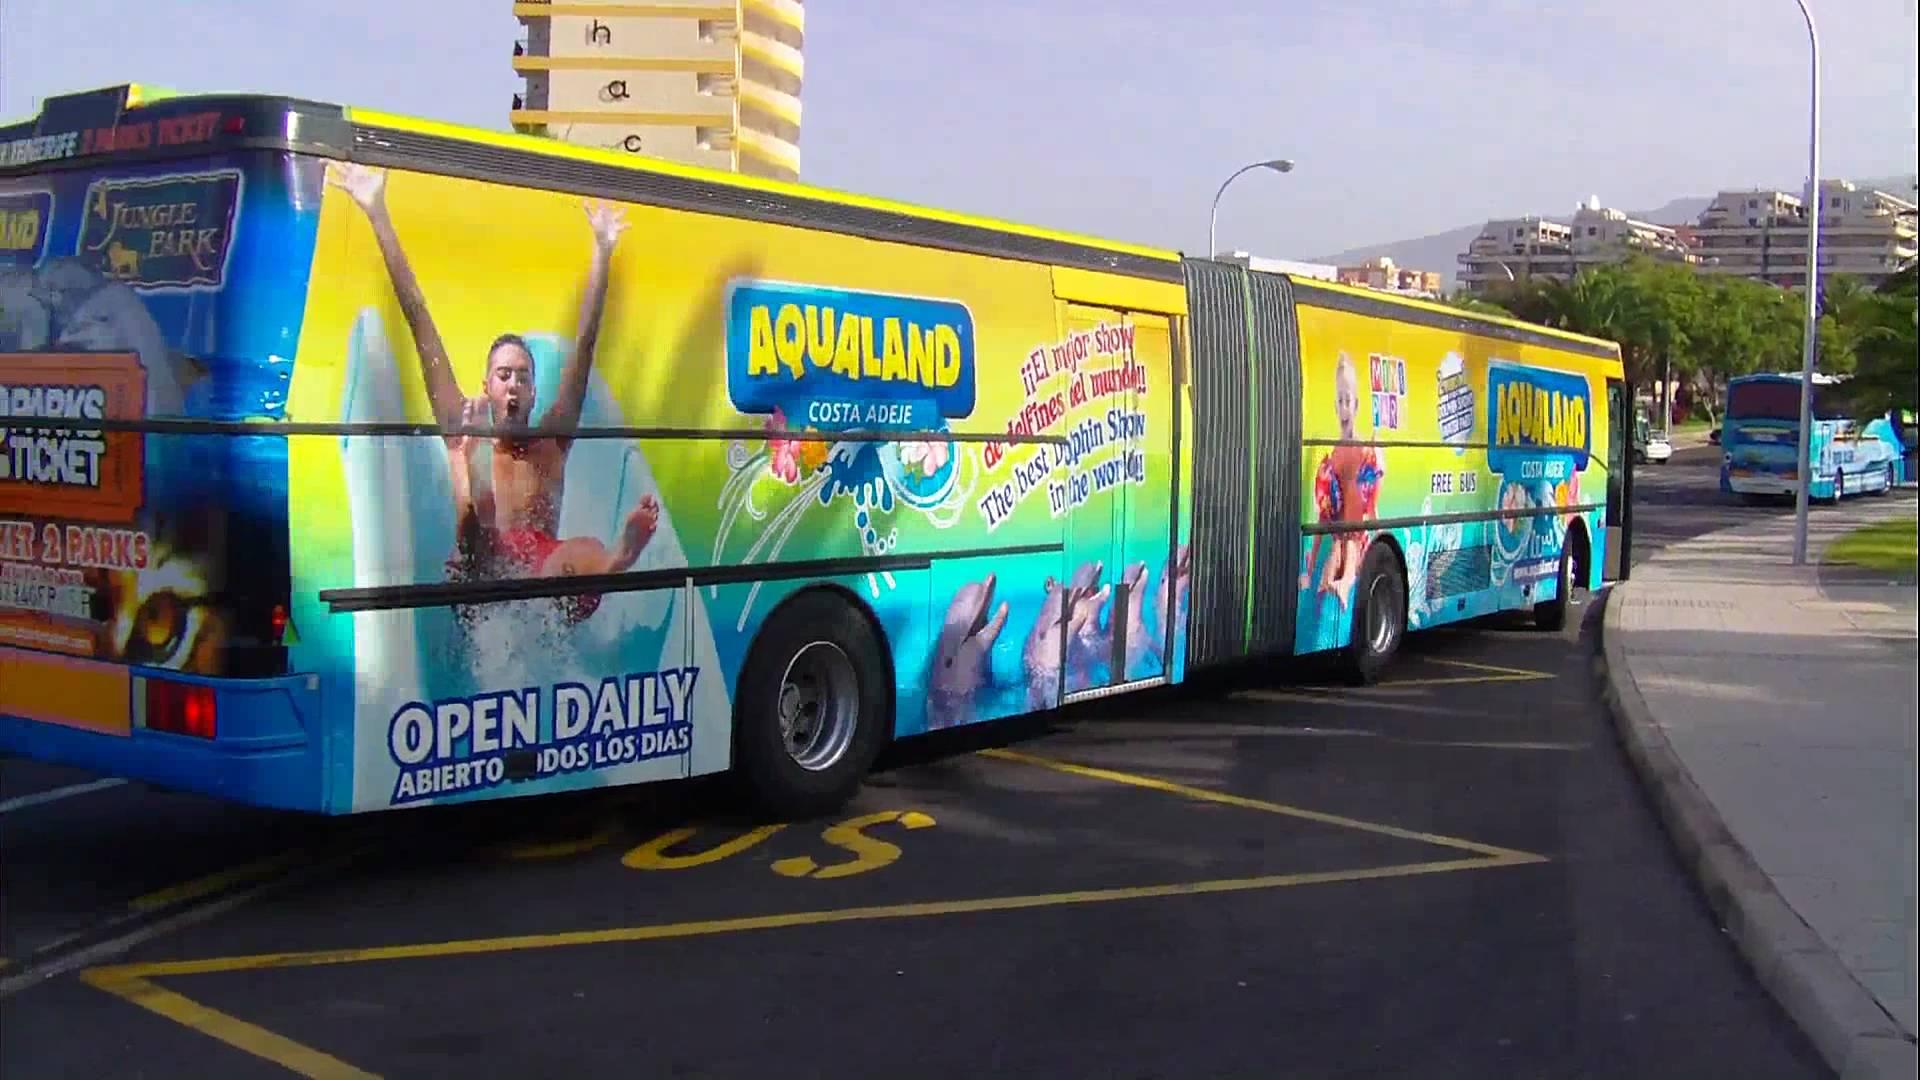 Фото бесплатного автобуса Аквапарка Акваленд на Тенерифе